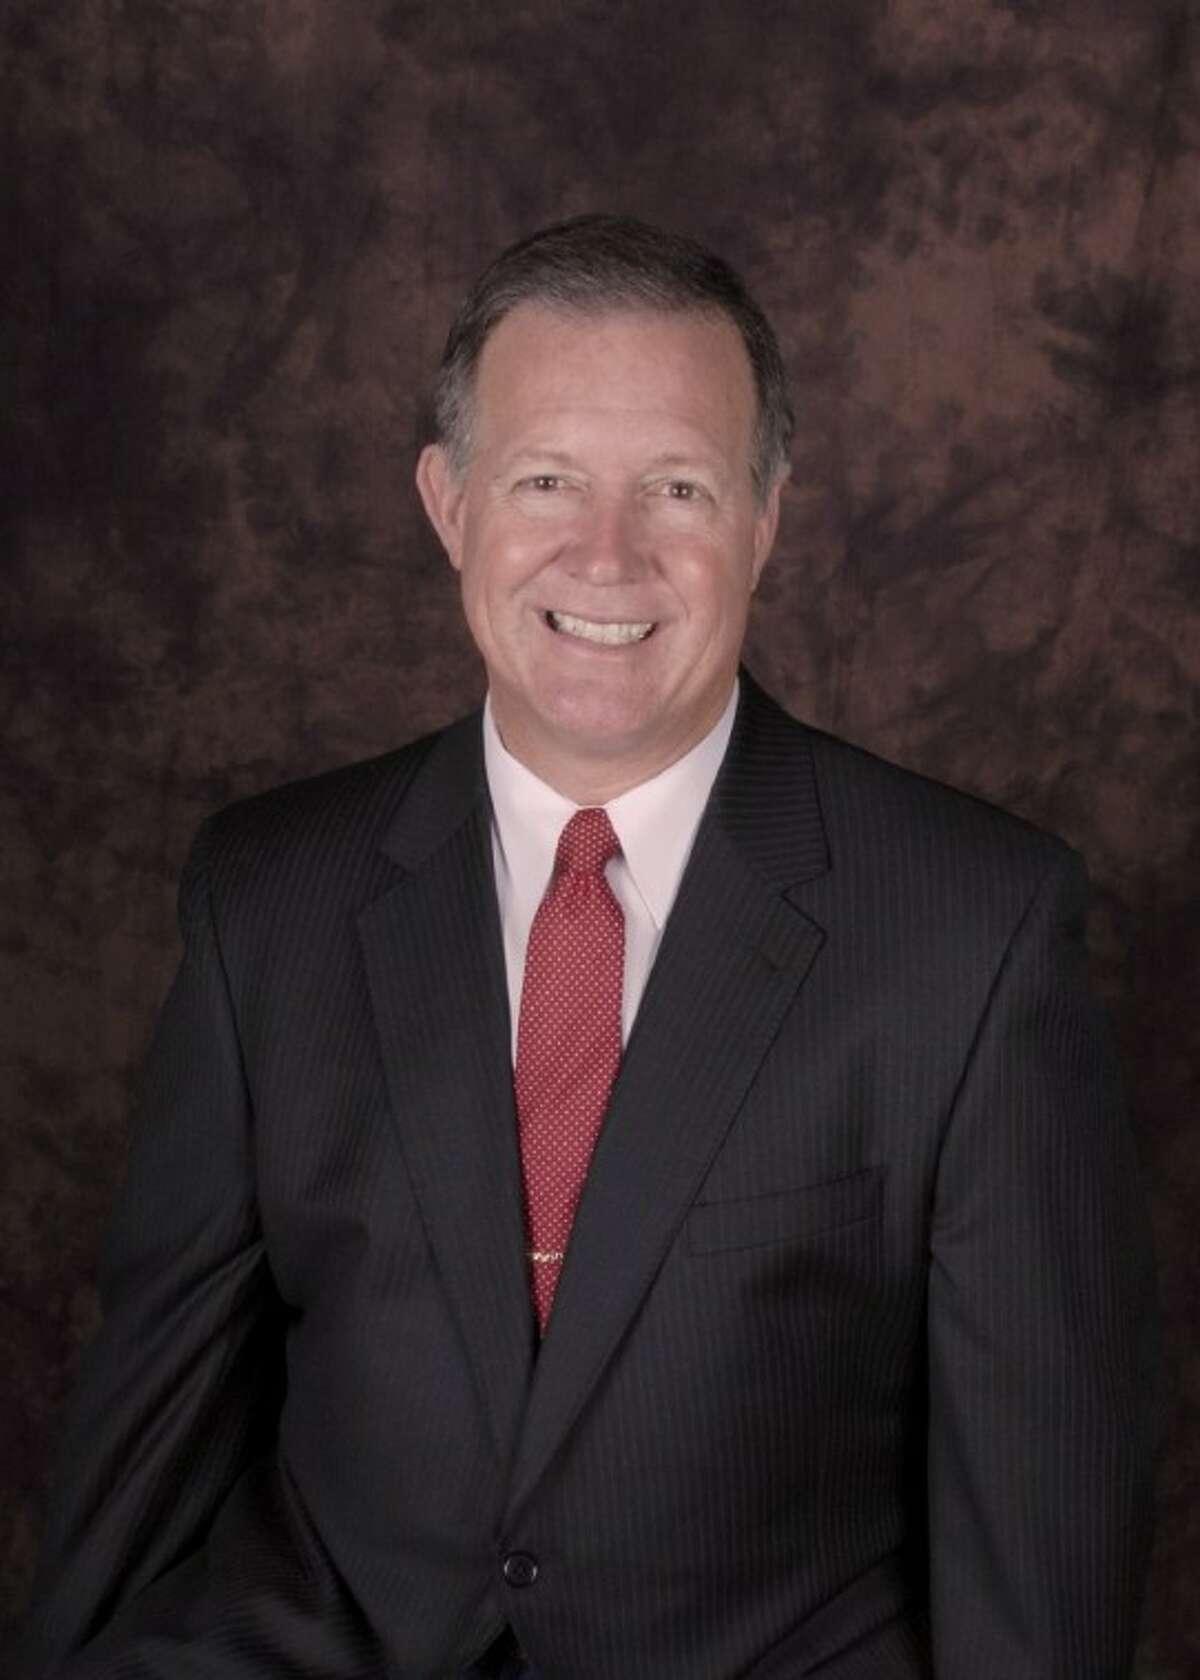 Rebulican Congressional Candidate Randy Weber